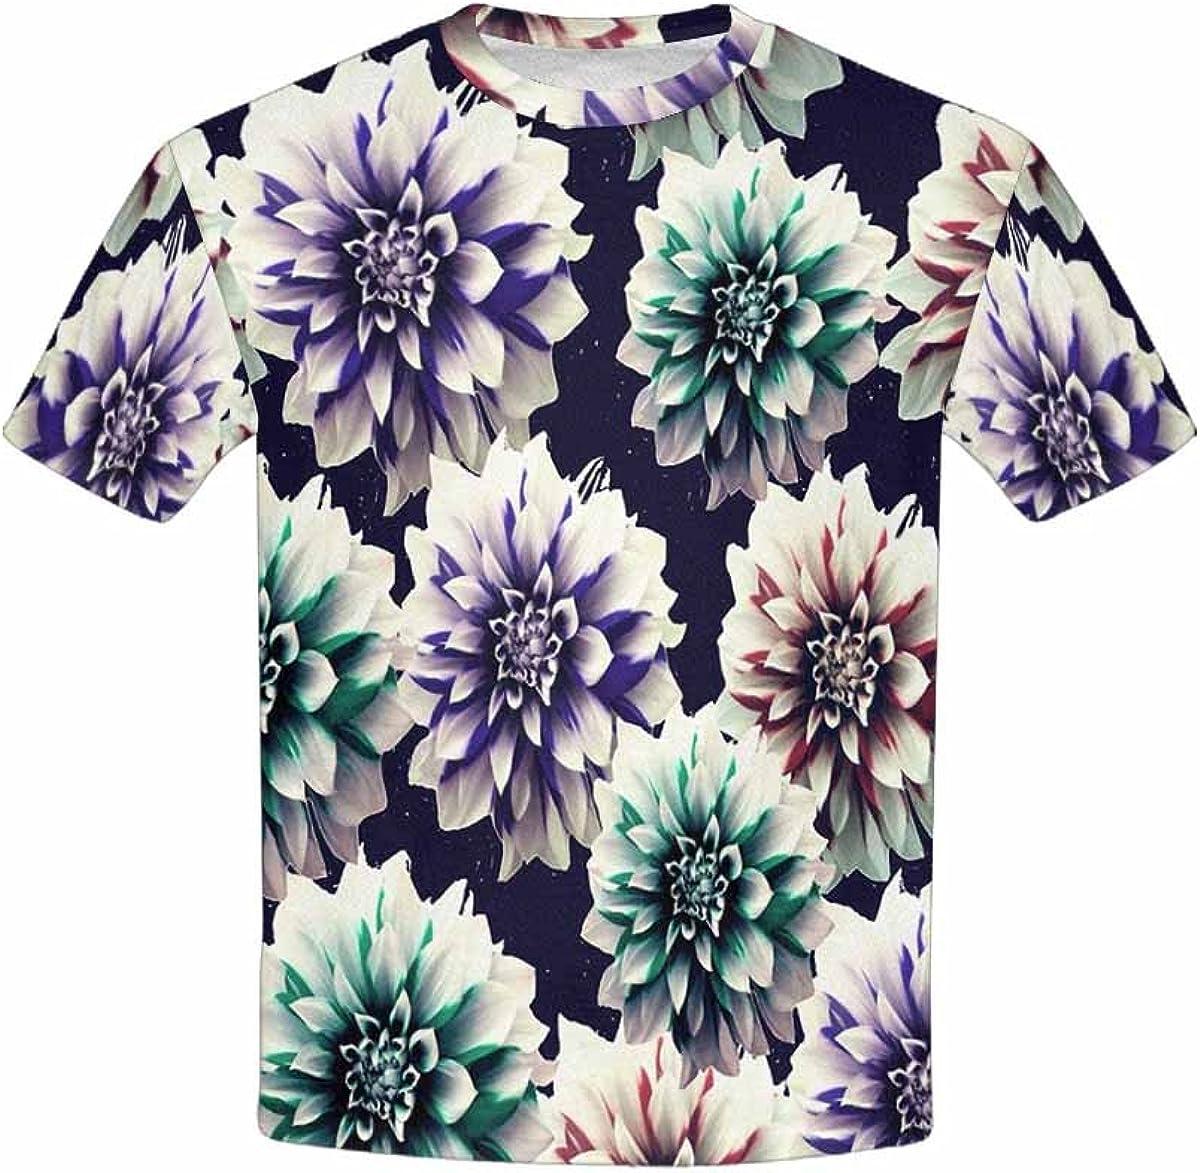 INTERESTPRINT Kids T-Shirt Psychedelic Vintage Floral Pattern XS-XL